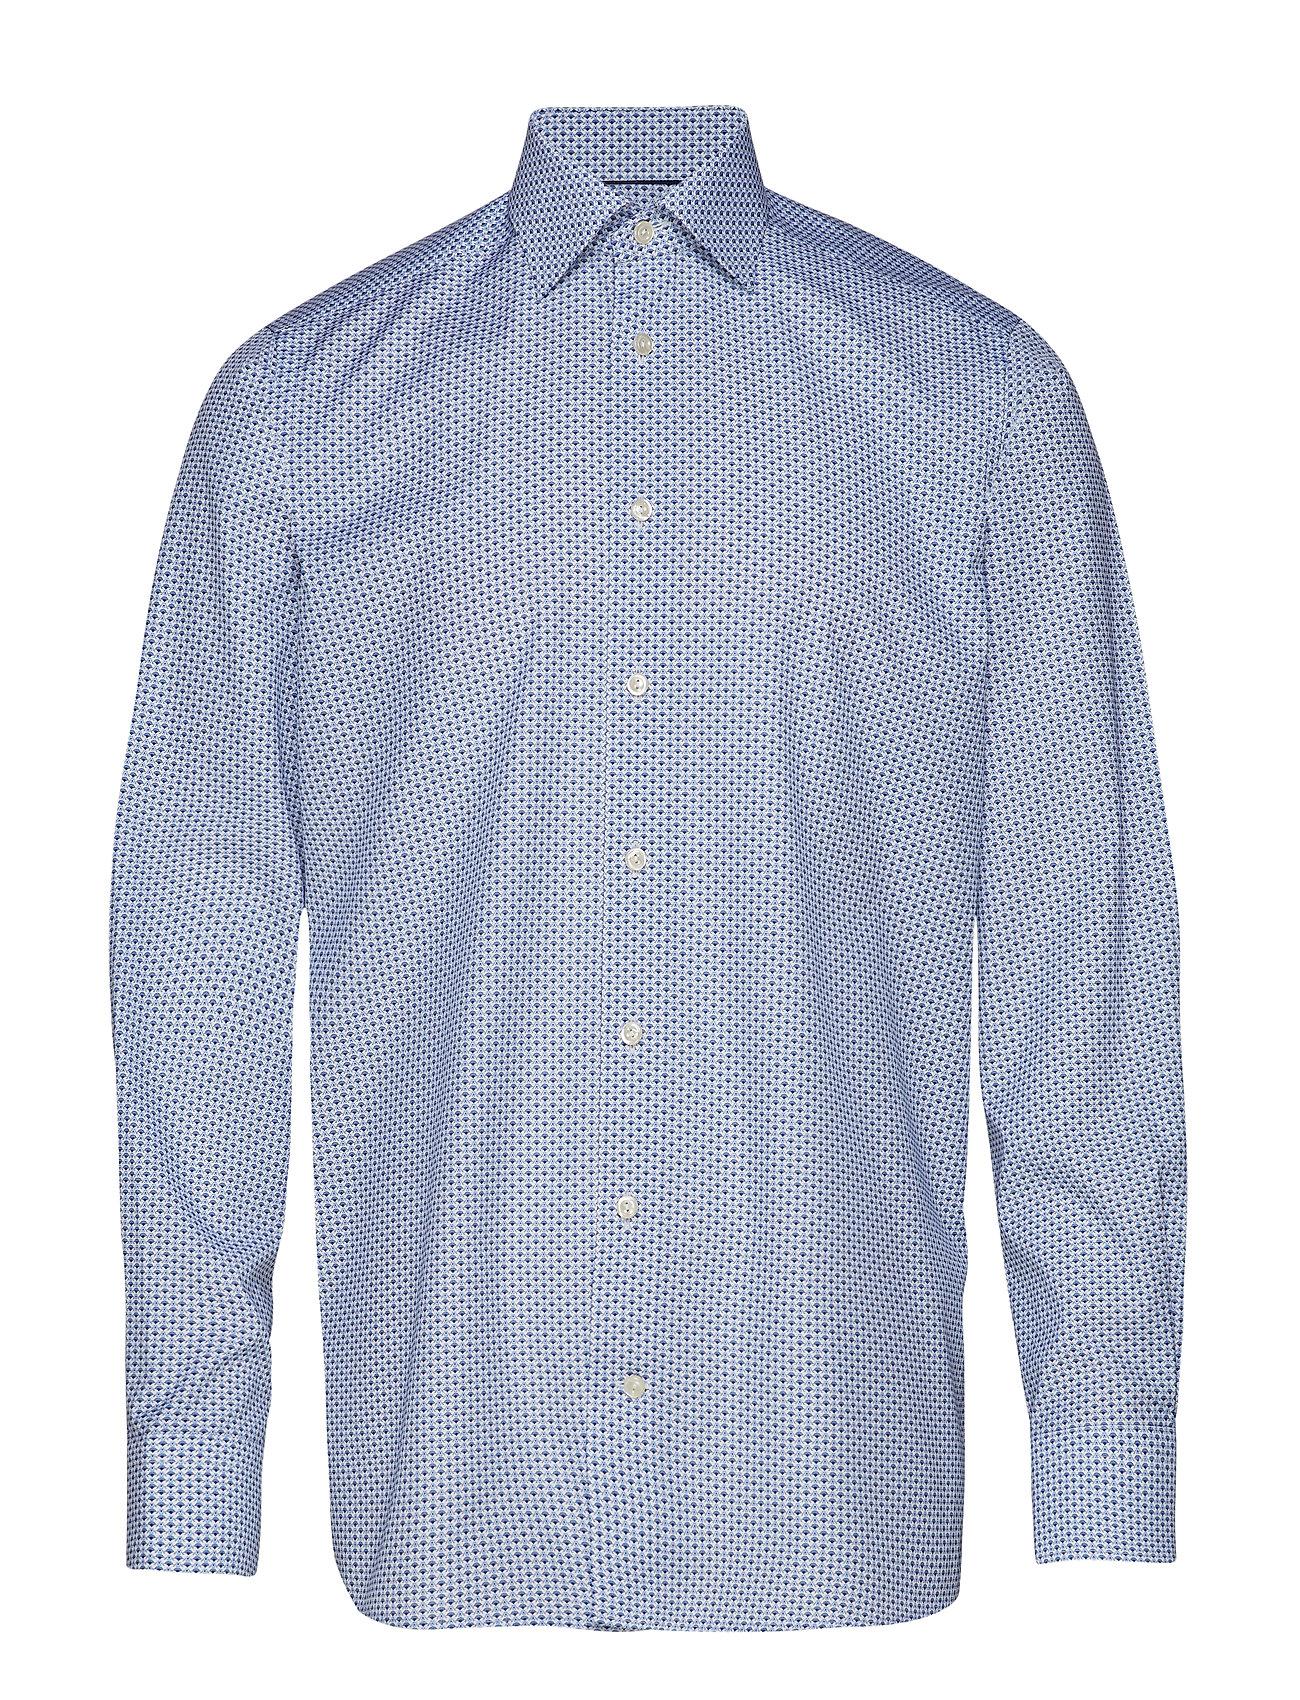 Eton Floral Micro Print Poplin Shirt - BLUE